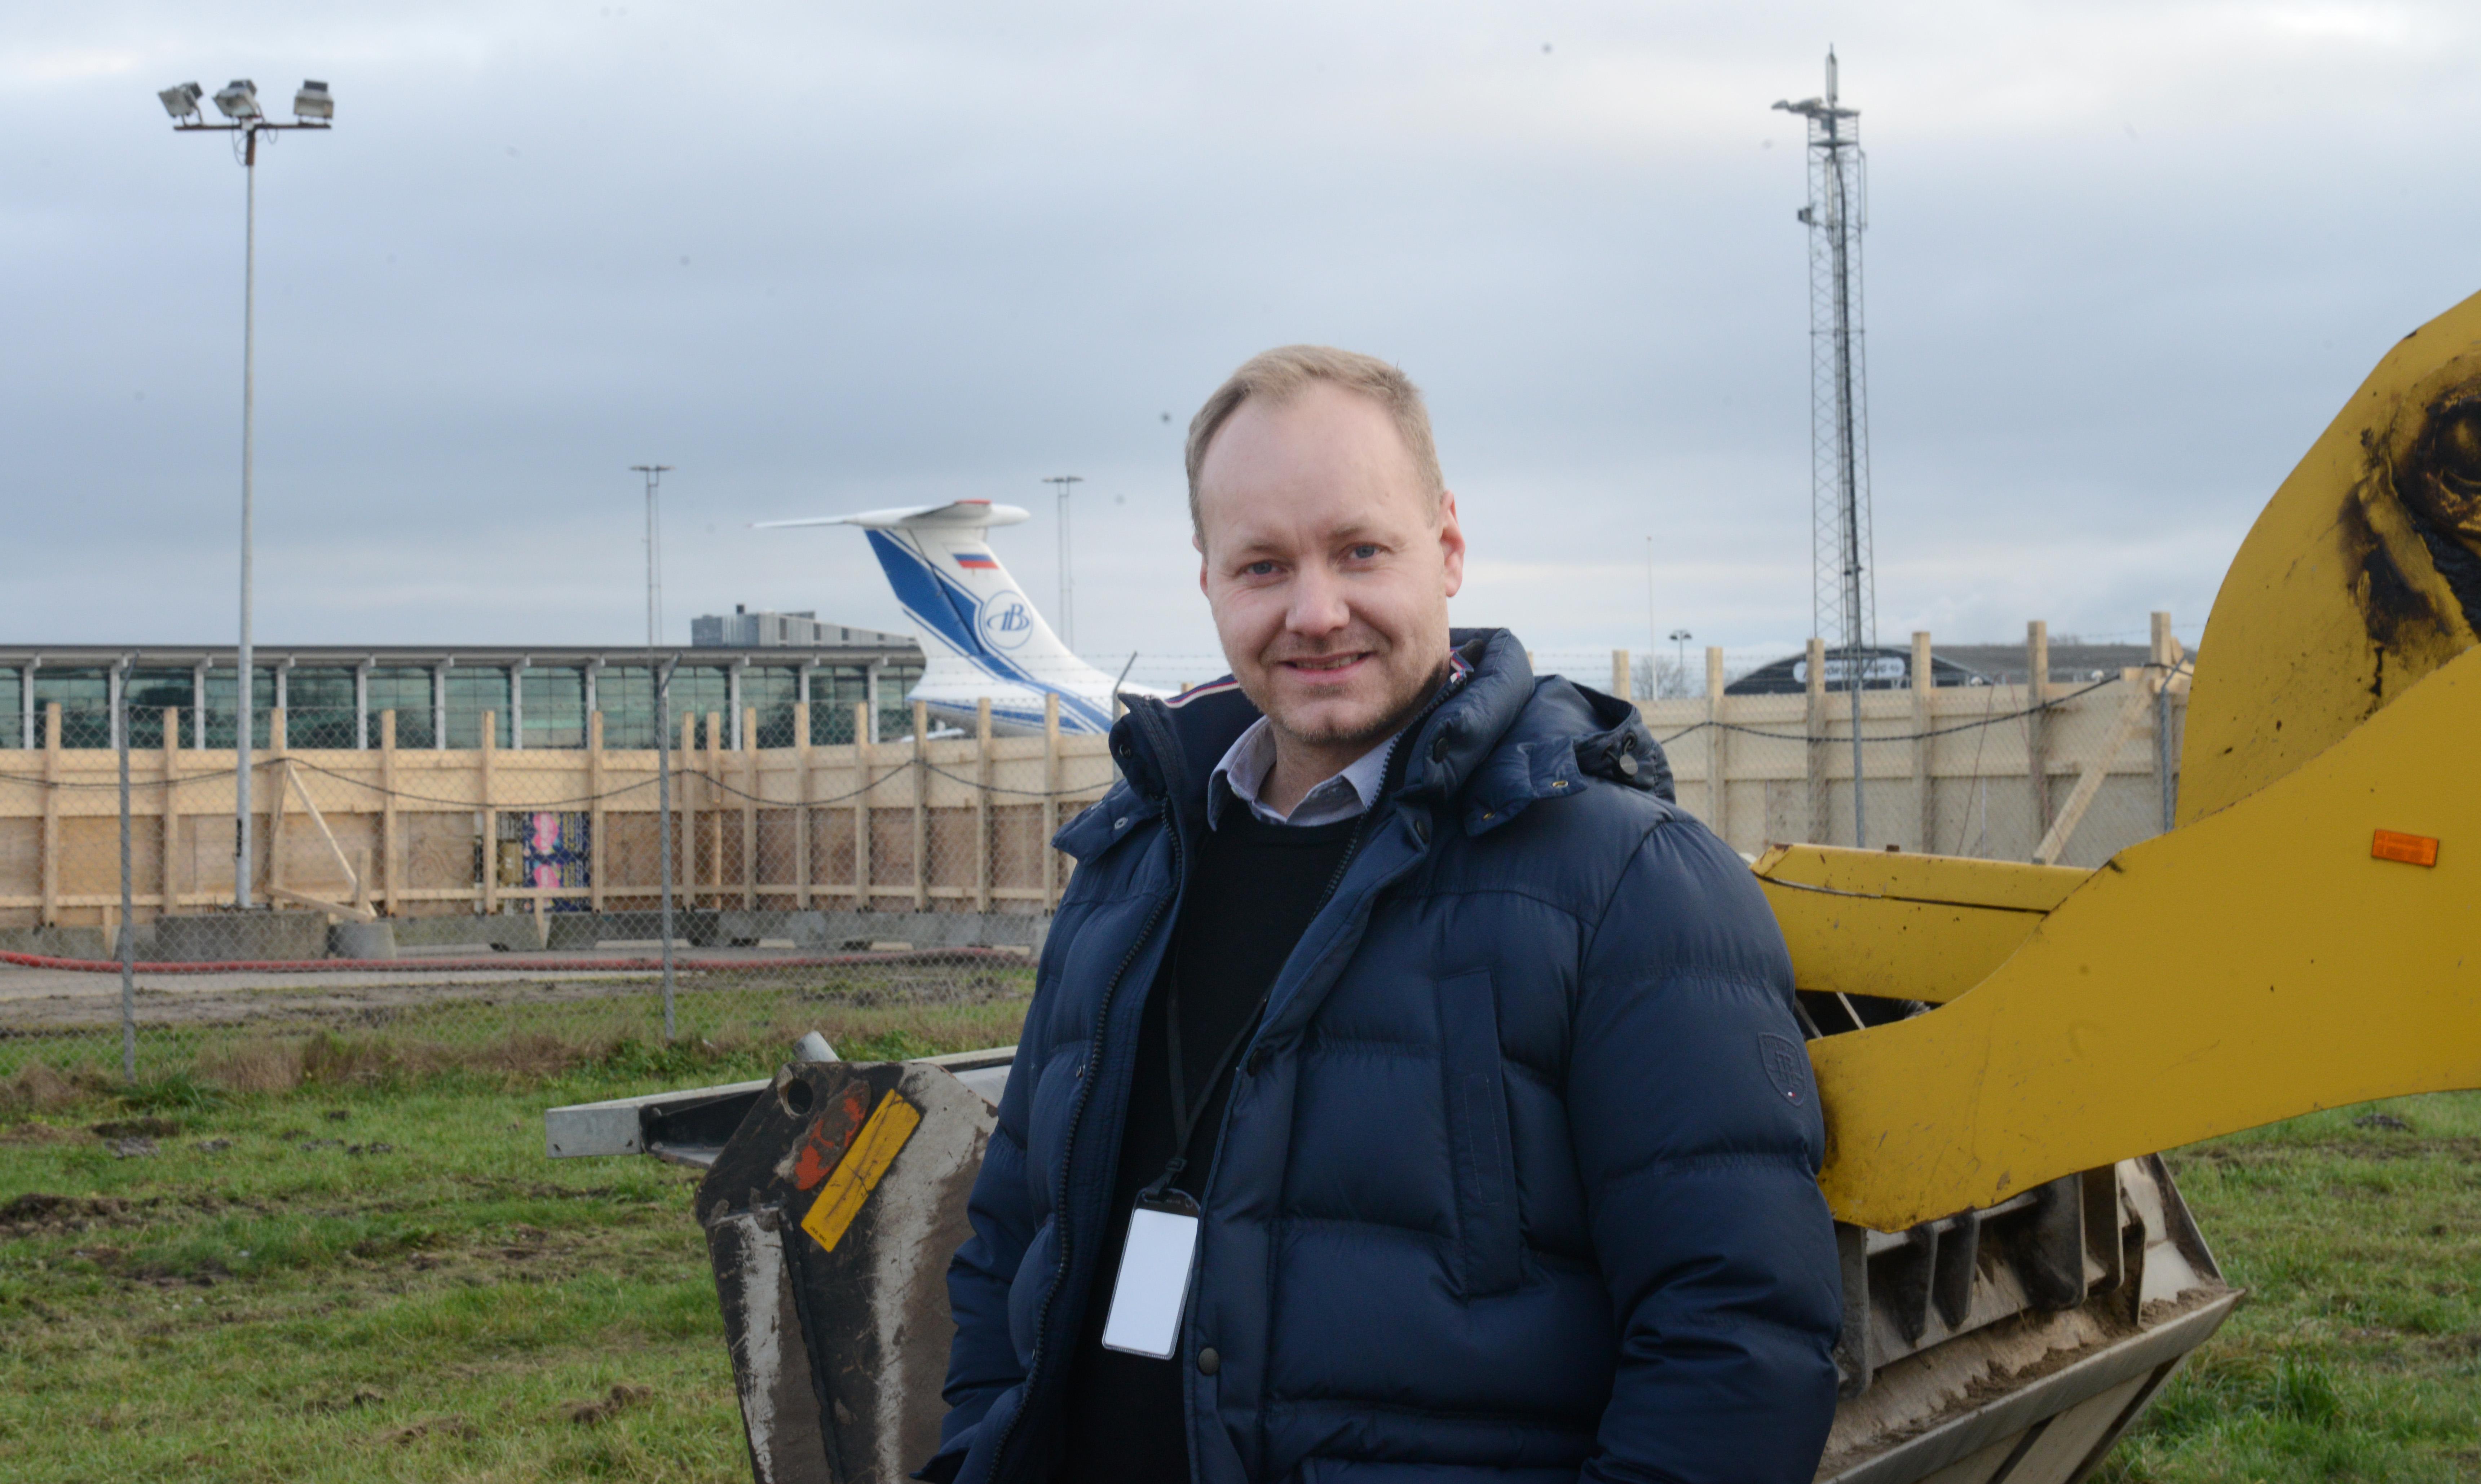 Stationschef for GMT i Aalborg Lufthavn, Magnus Omarsson, ved byggepladsen for den kommende hangar i Aalborg Lufthavn (Foto: Joakim J. Hvistendahl)